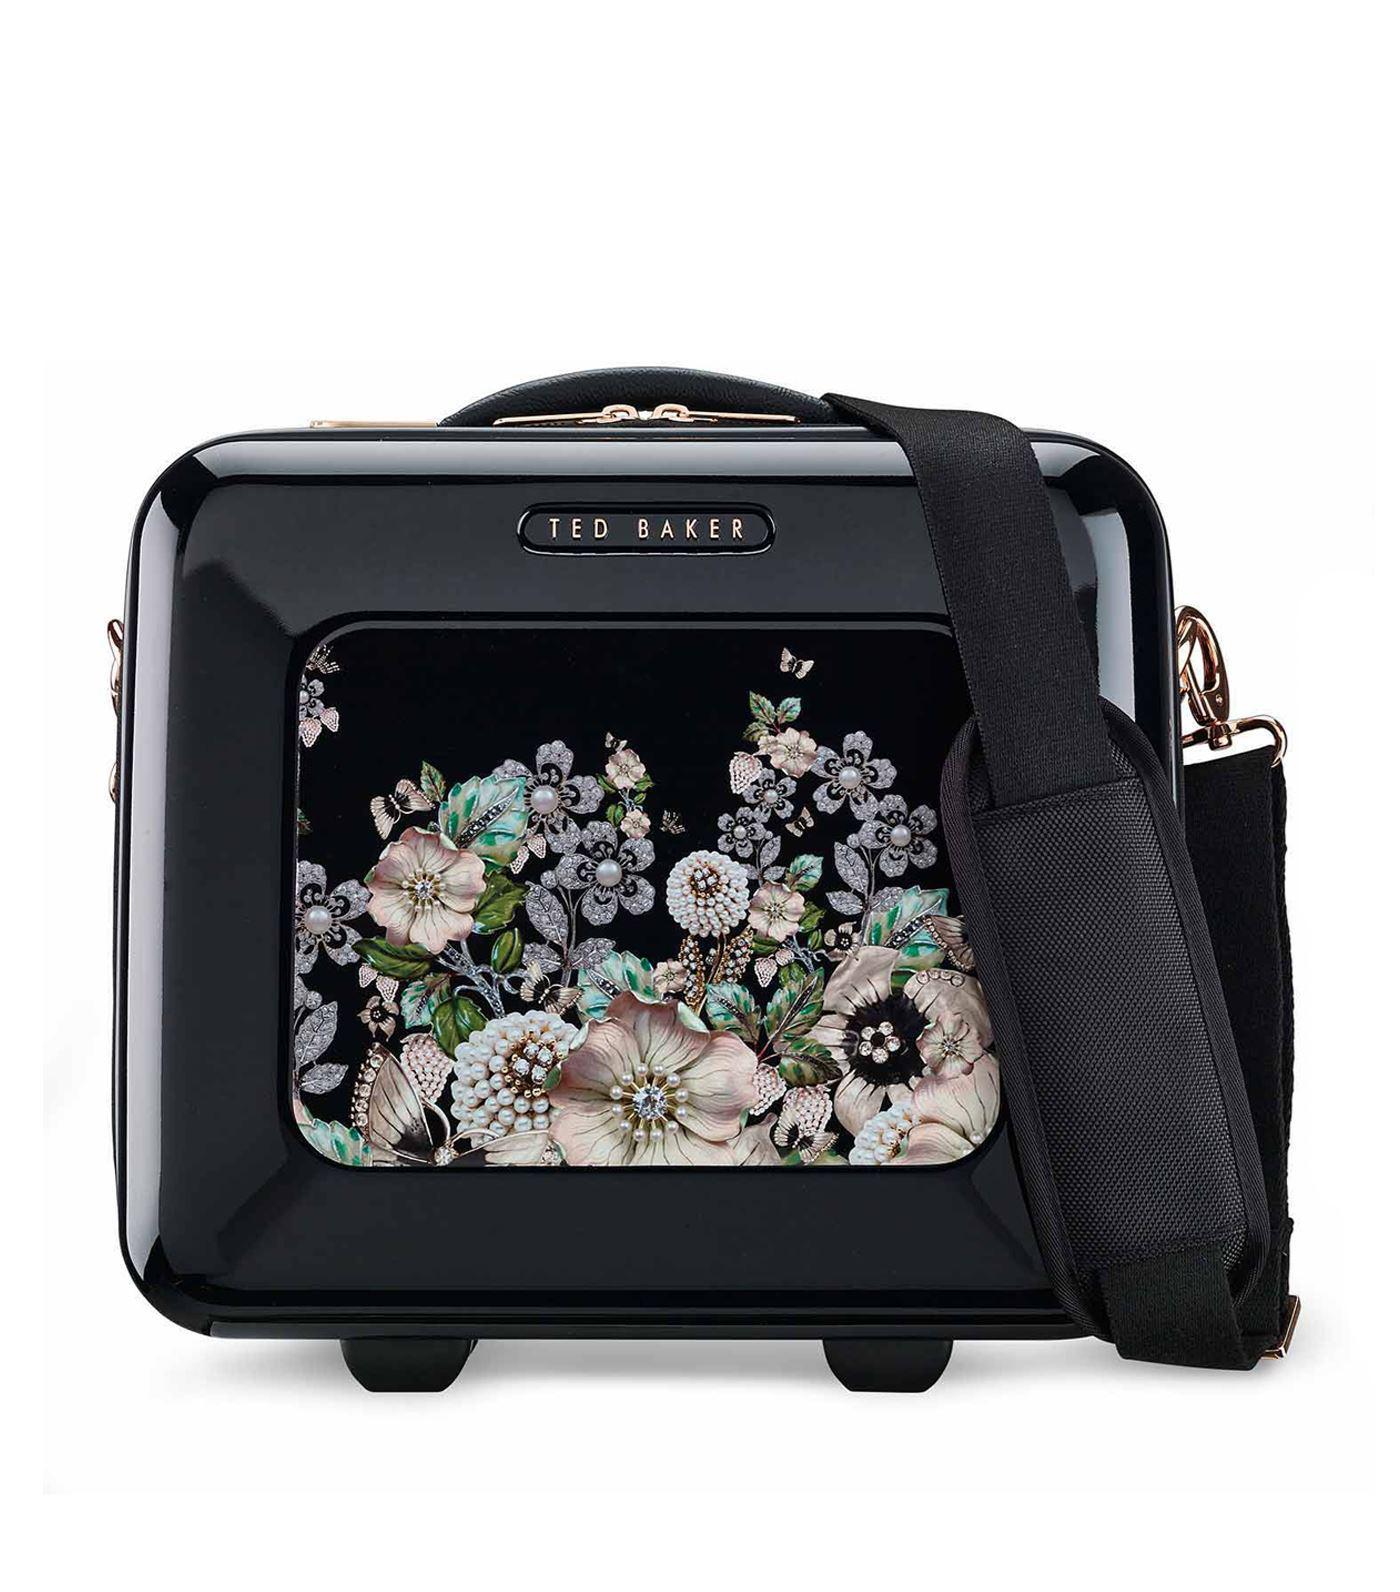 2629c7f9d Lyst - Ted Baker Gem Gardens Vanity Case in Black